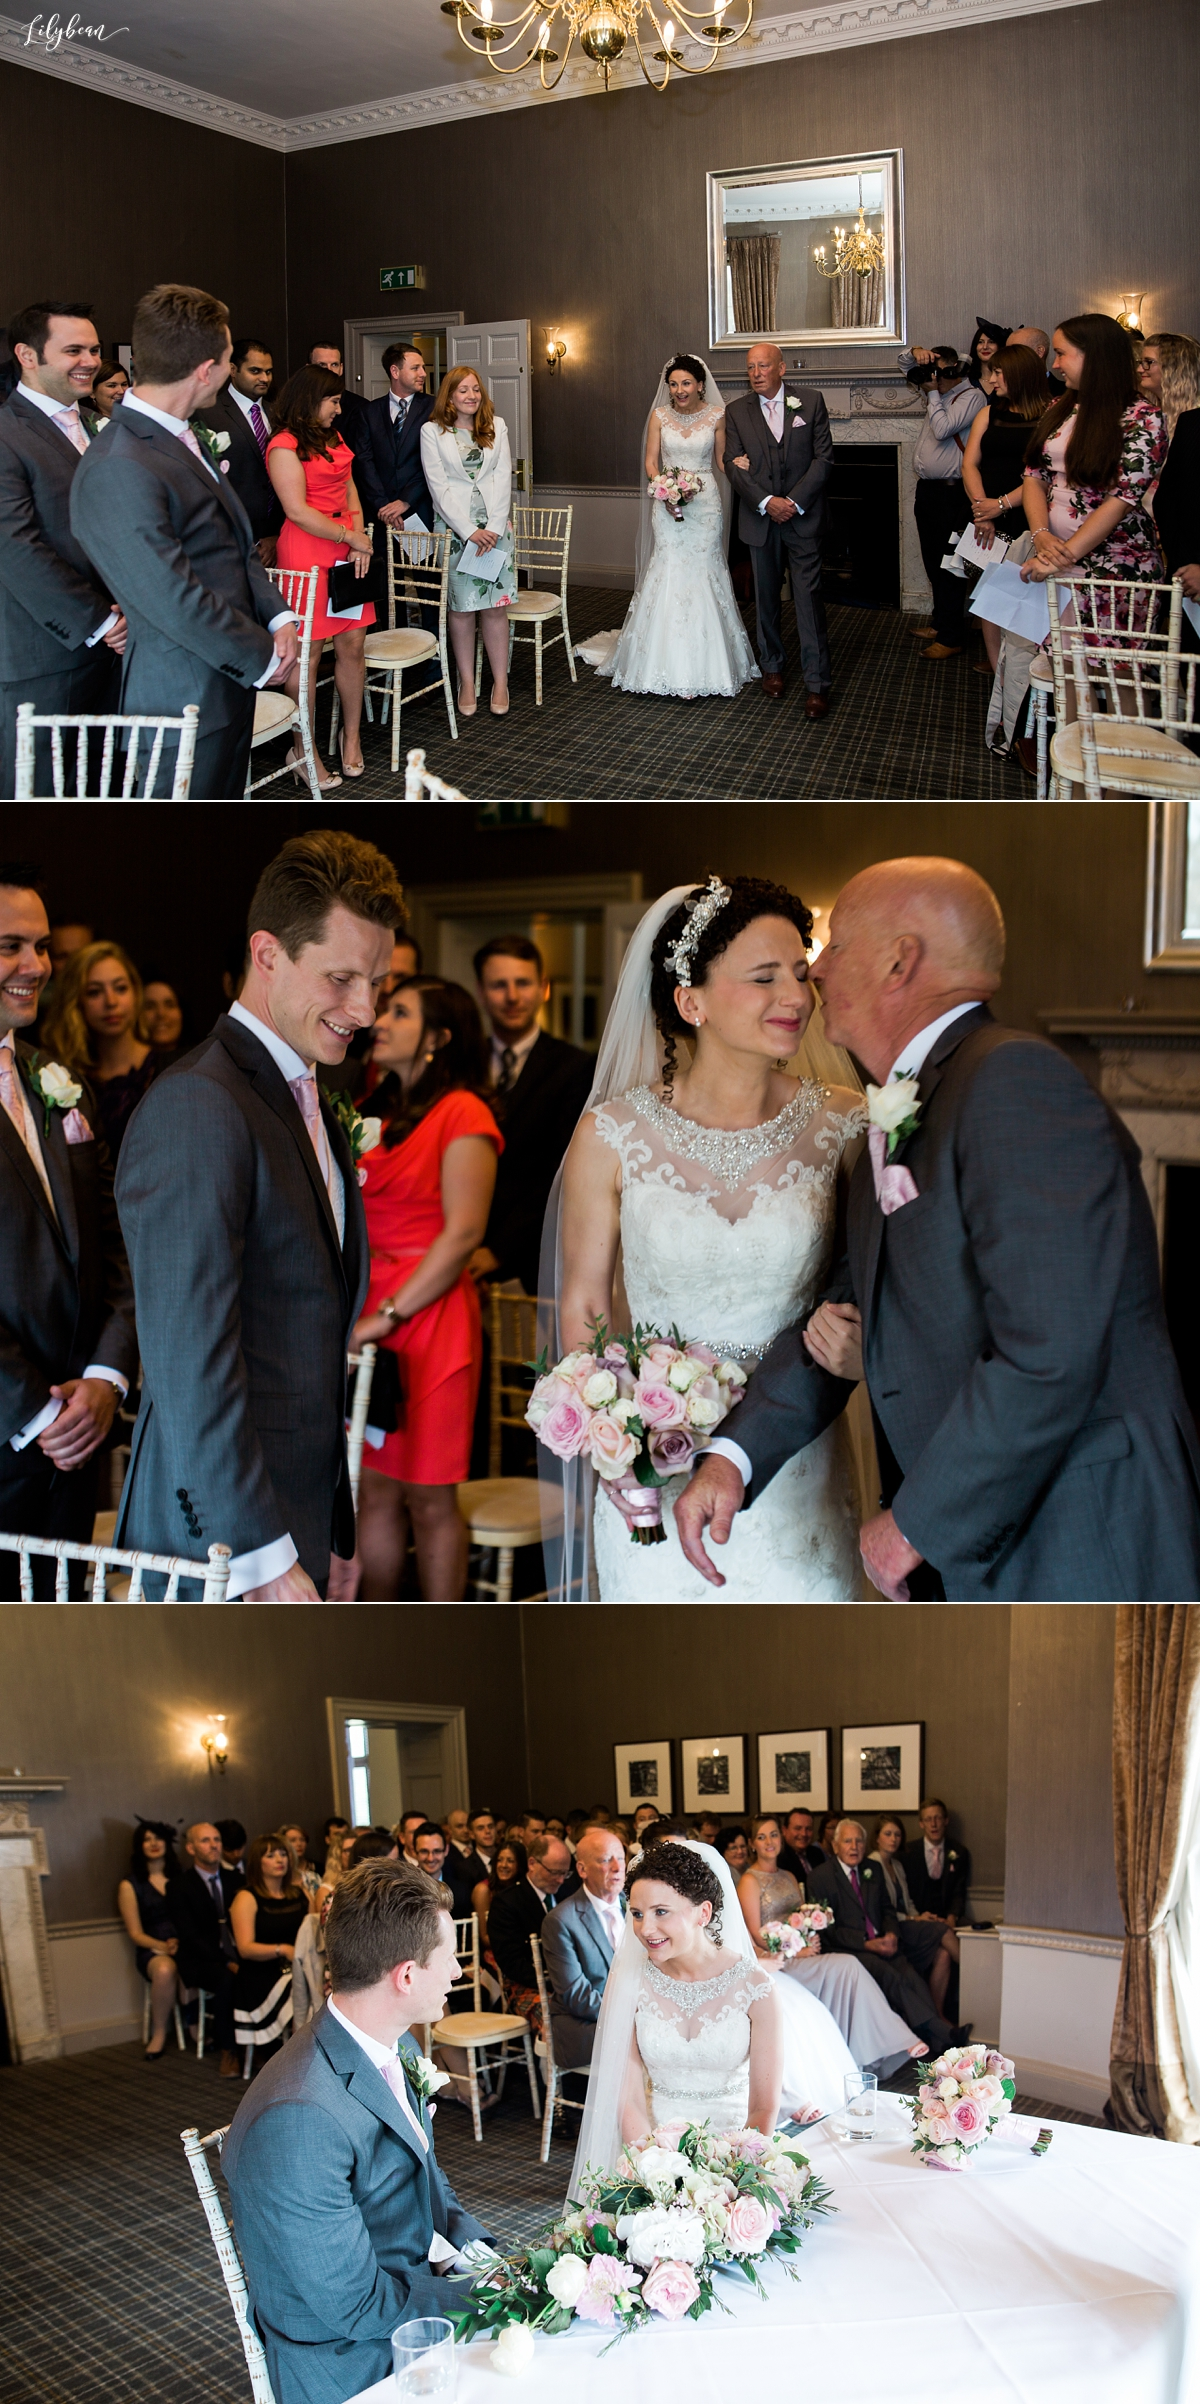 Wedding ceremony at Highfield Park